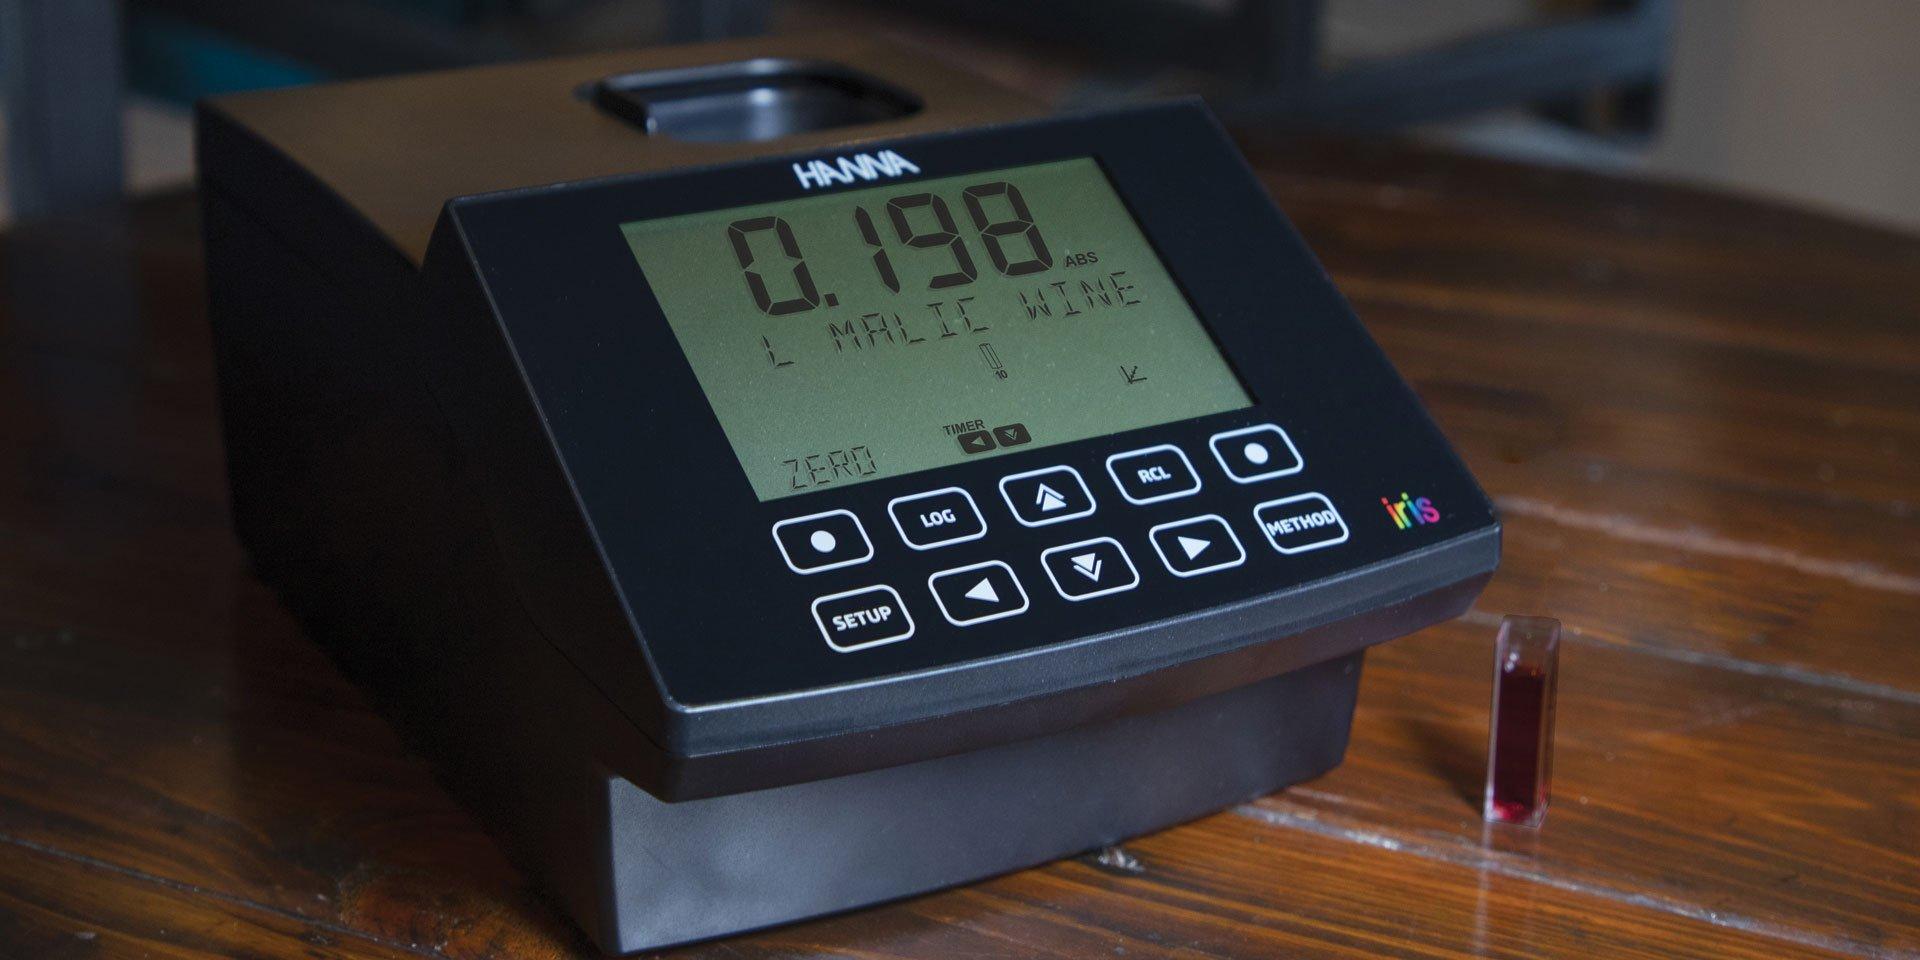 2-HI801-Iris-Spectrophotometer-on-wood